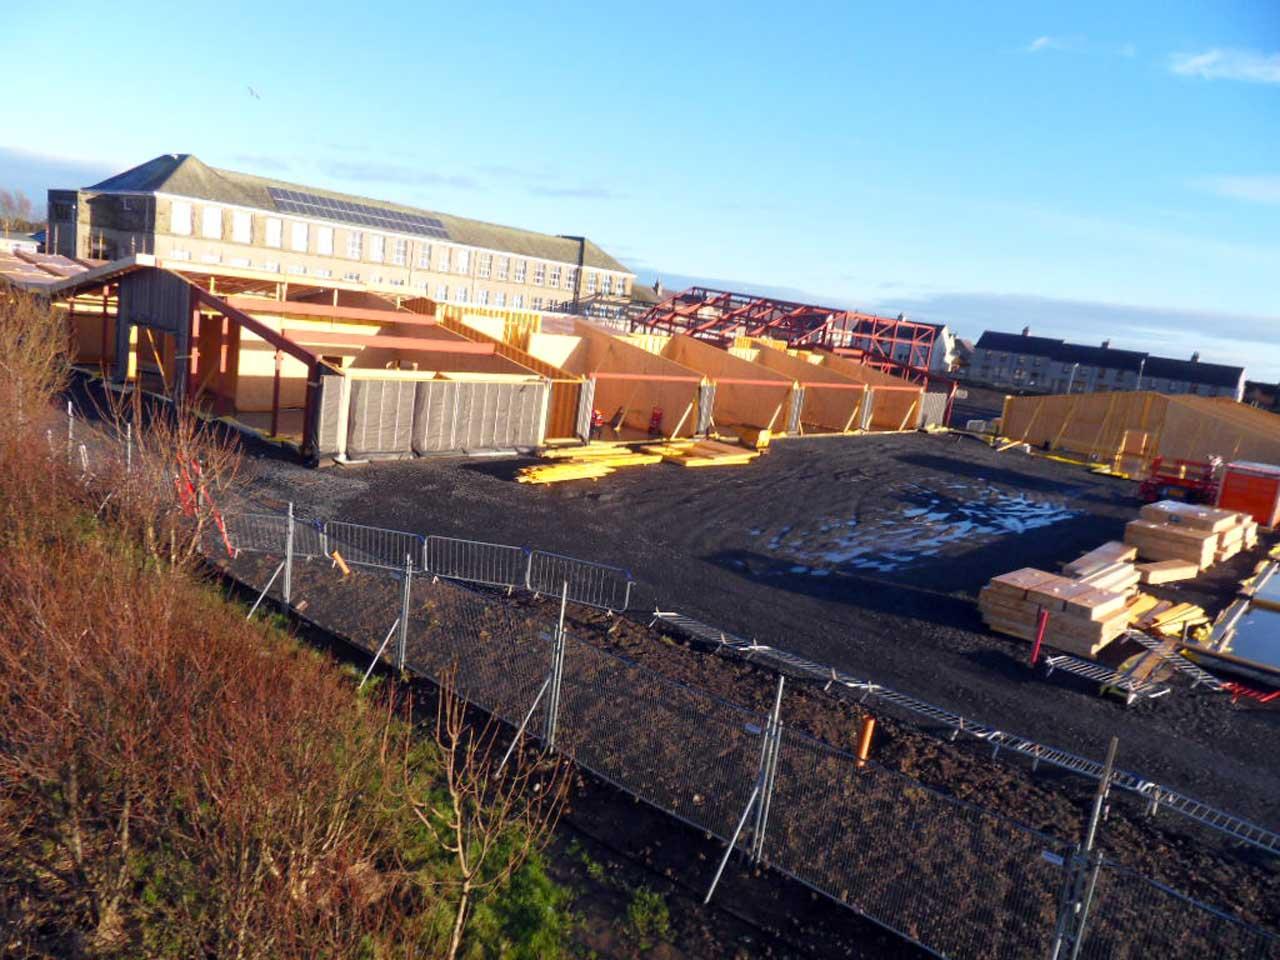 Photo: New Noss Primary School, Wick 4 January 2015